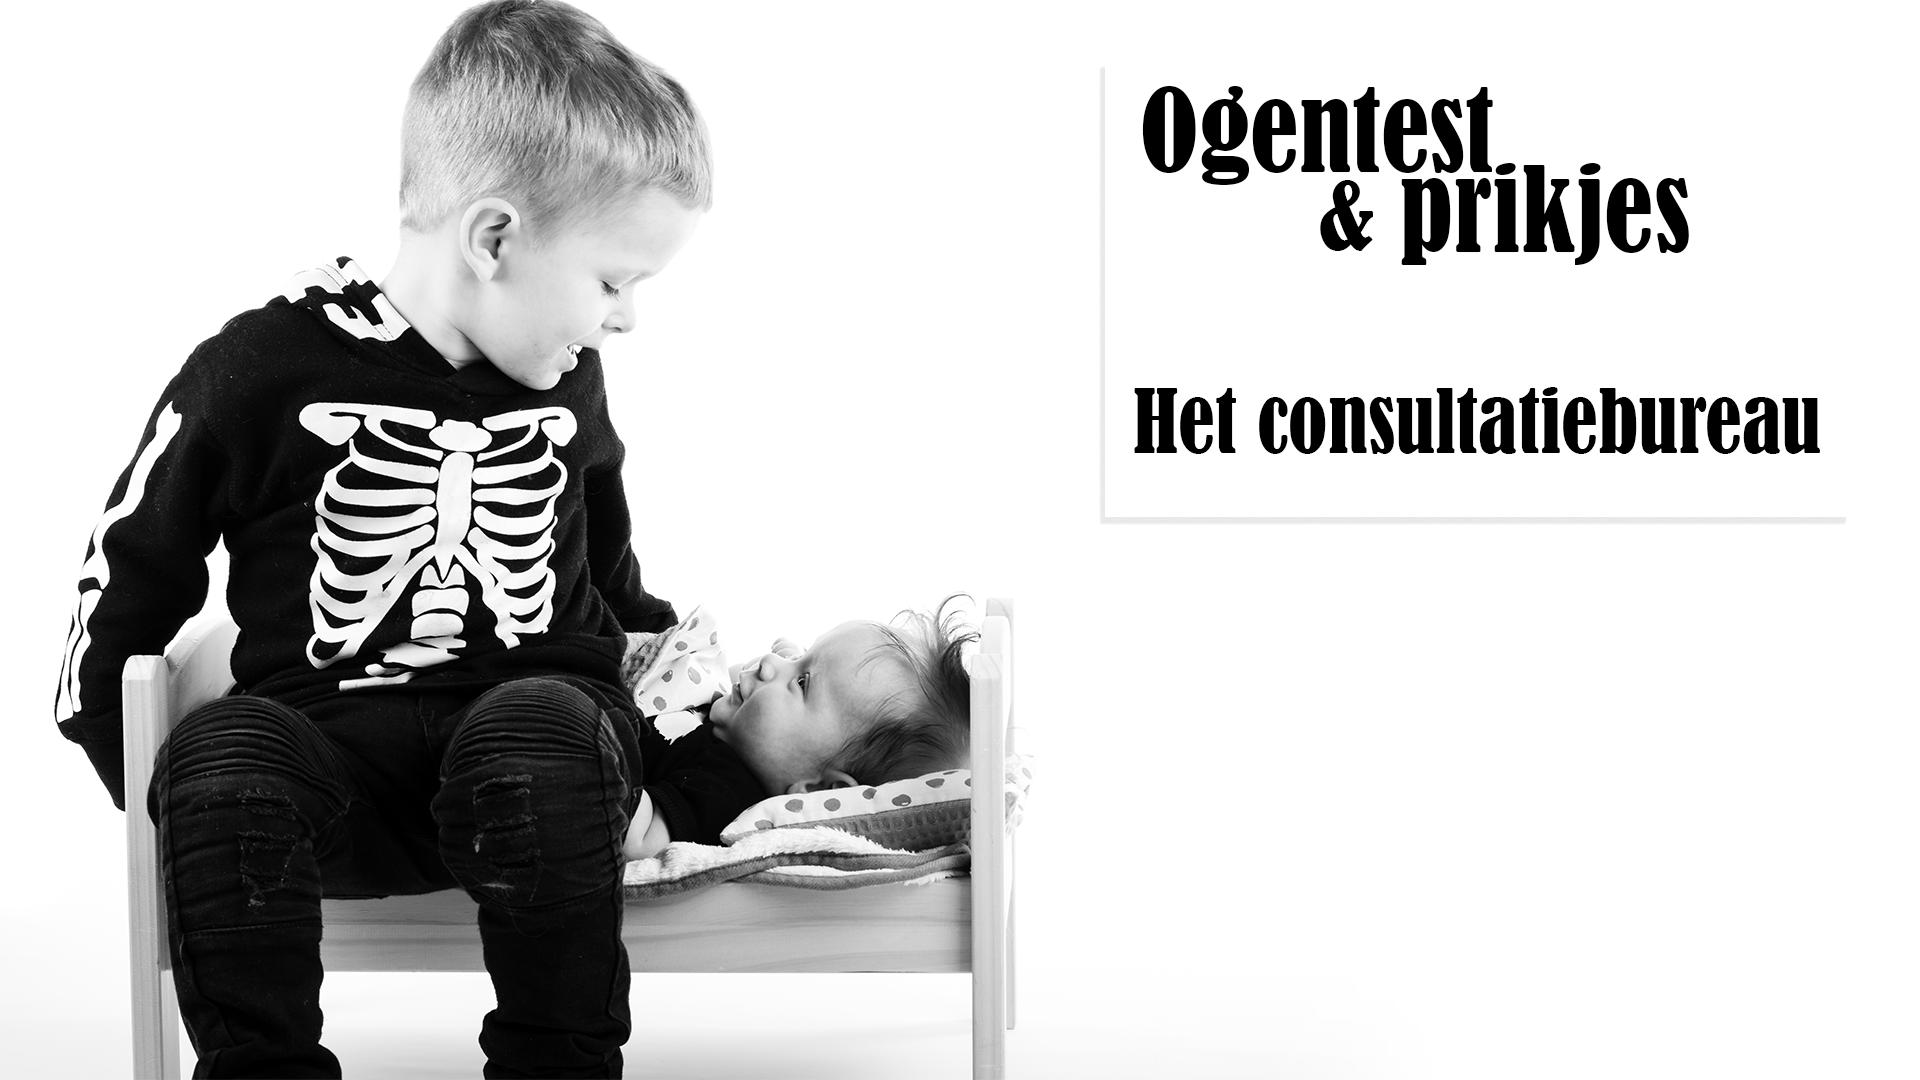 Ogentest consultatiebureau wegen meten 6 kilo 61 cm peuter baby mama blog www.liefkleinwonder.nl prikjes